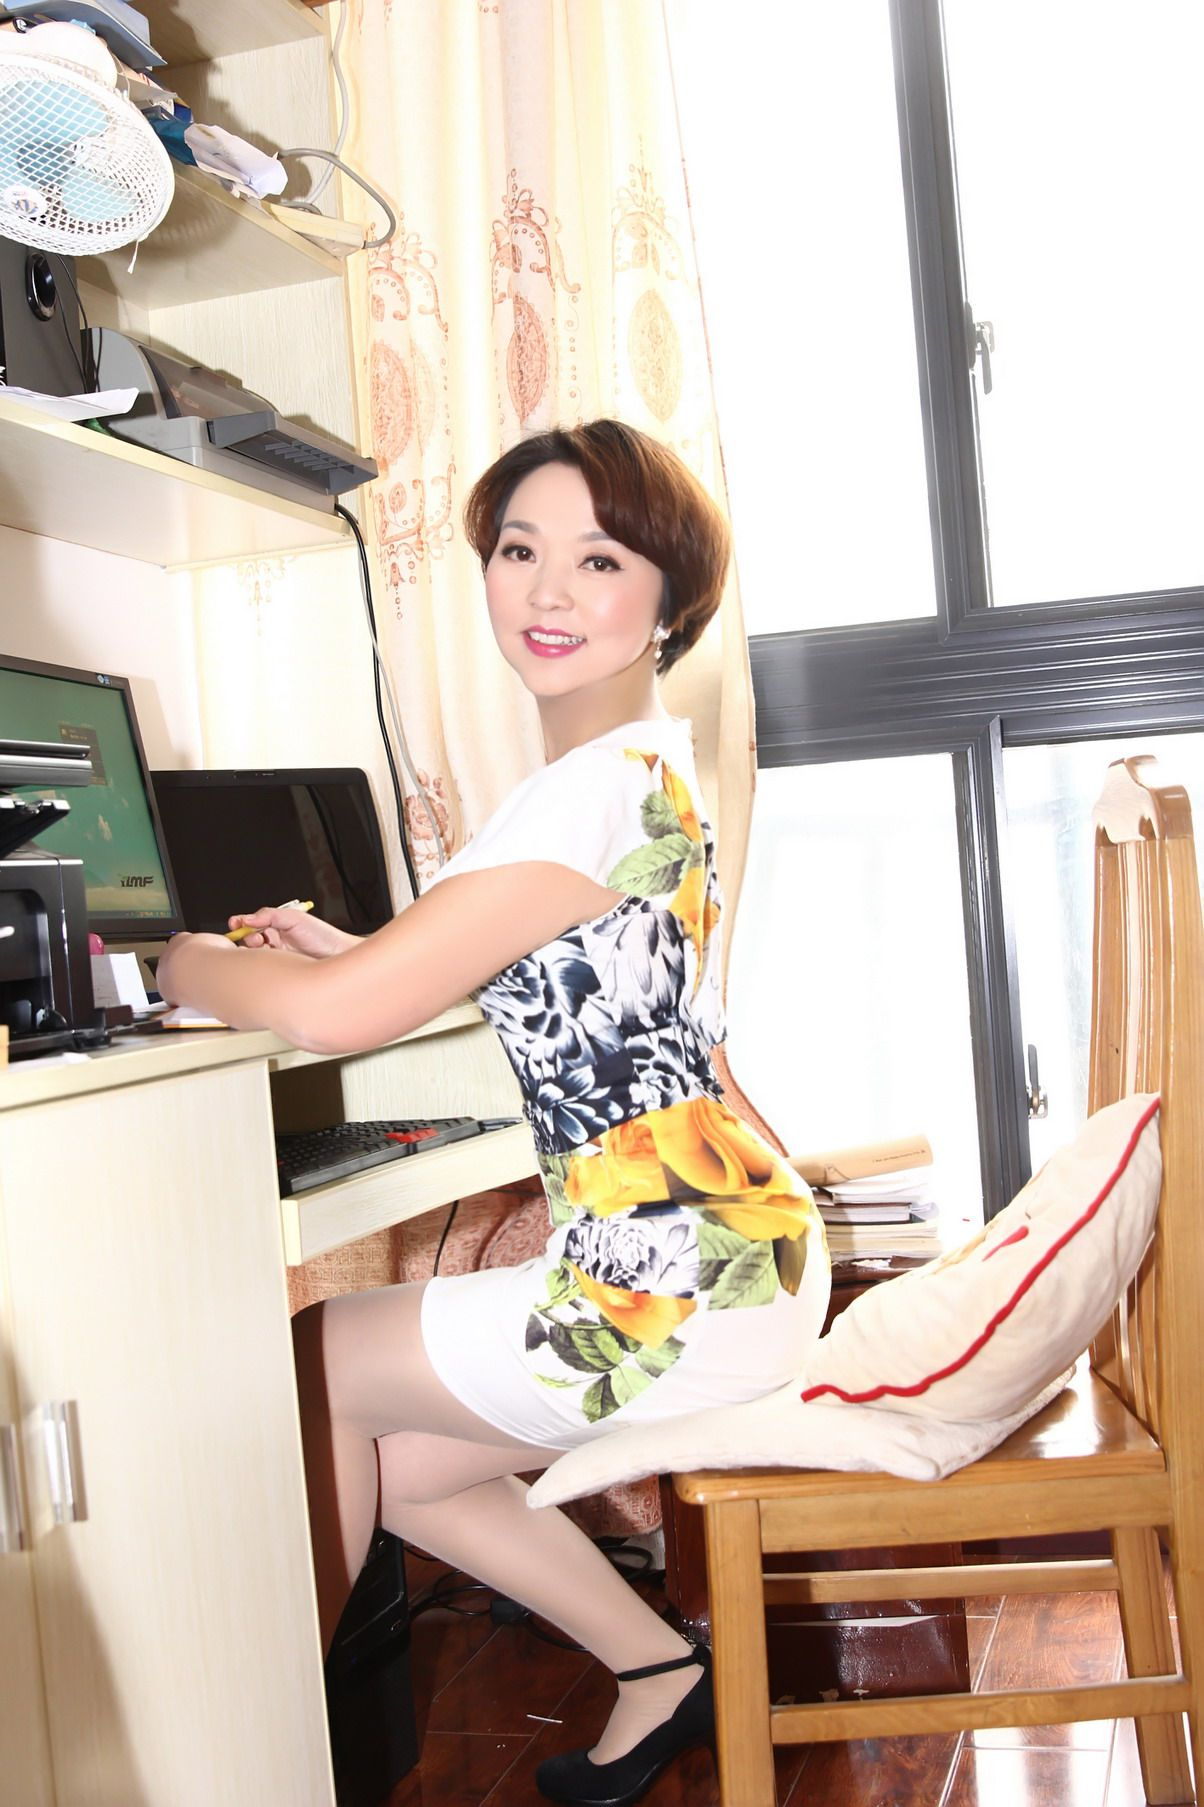 Asien single frauen